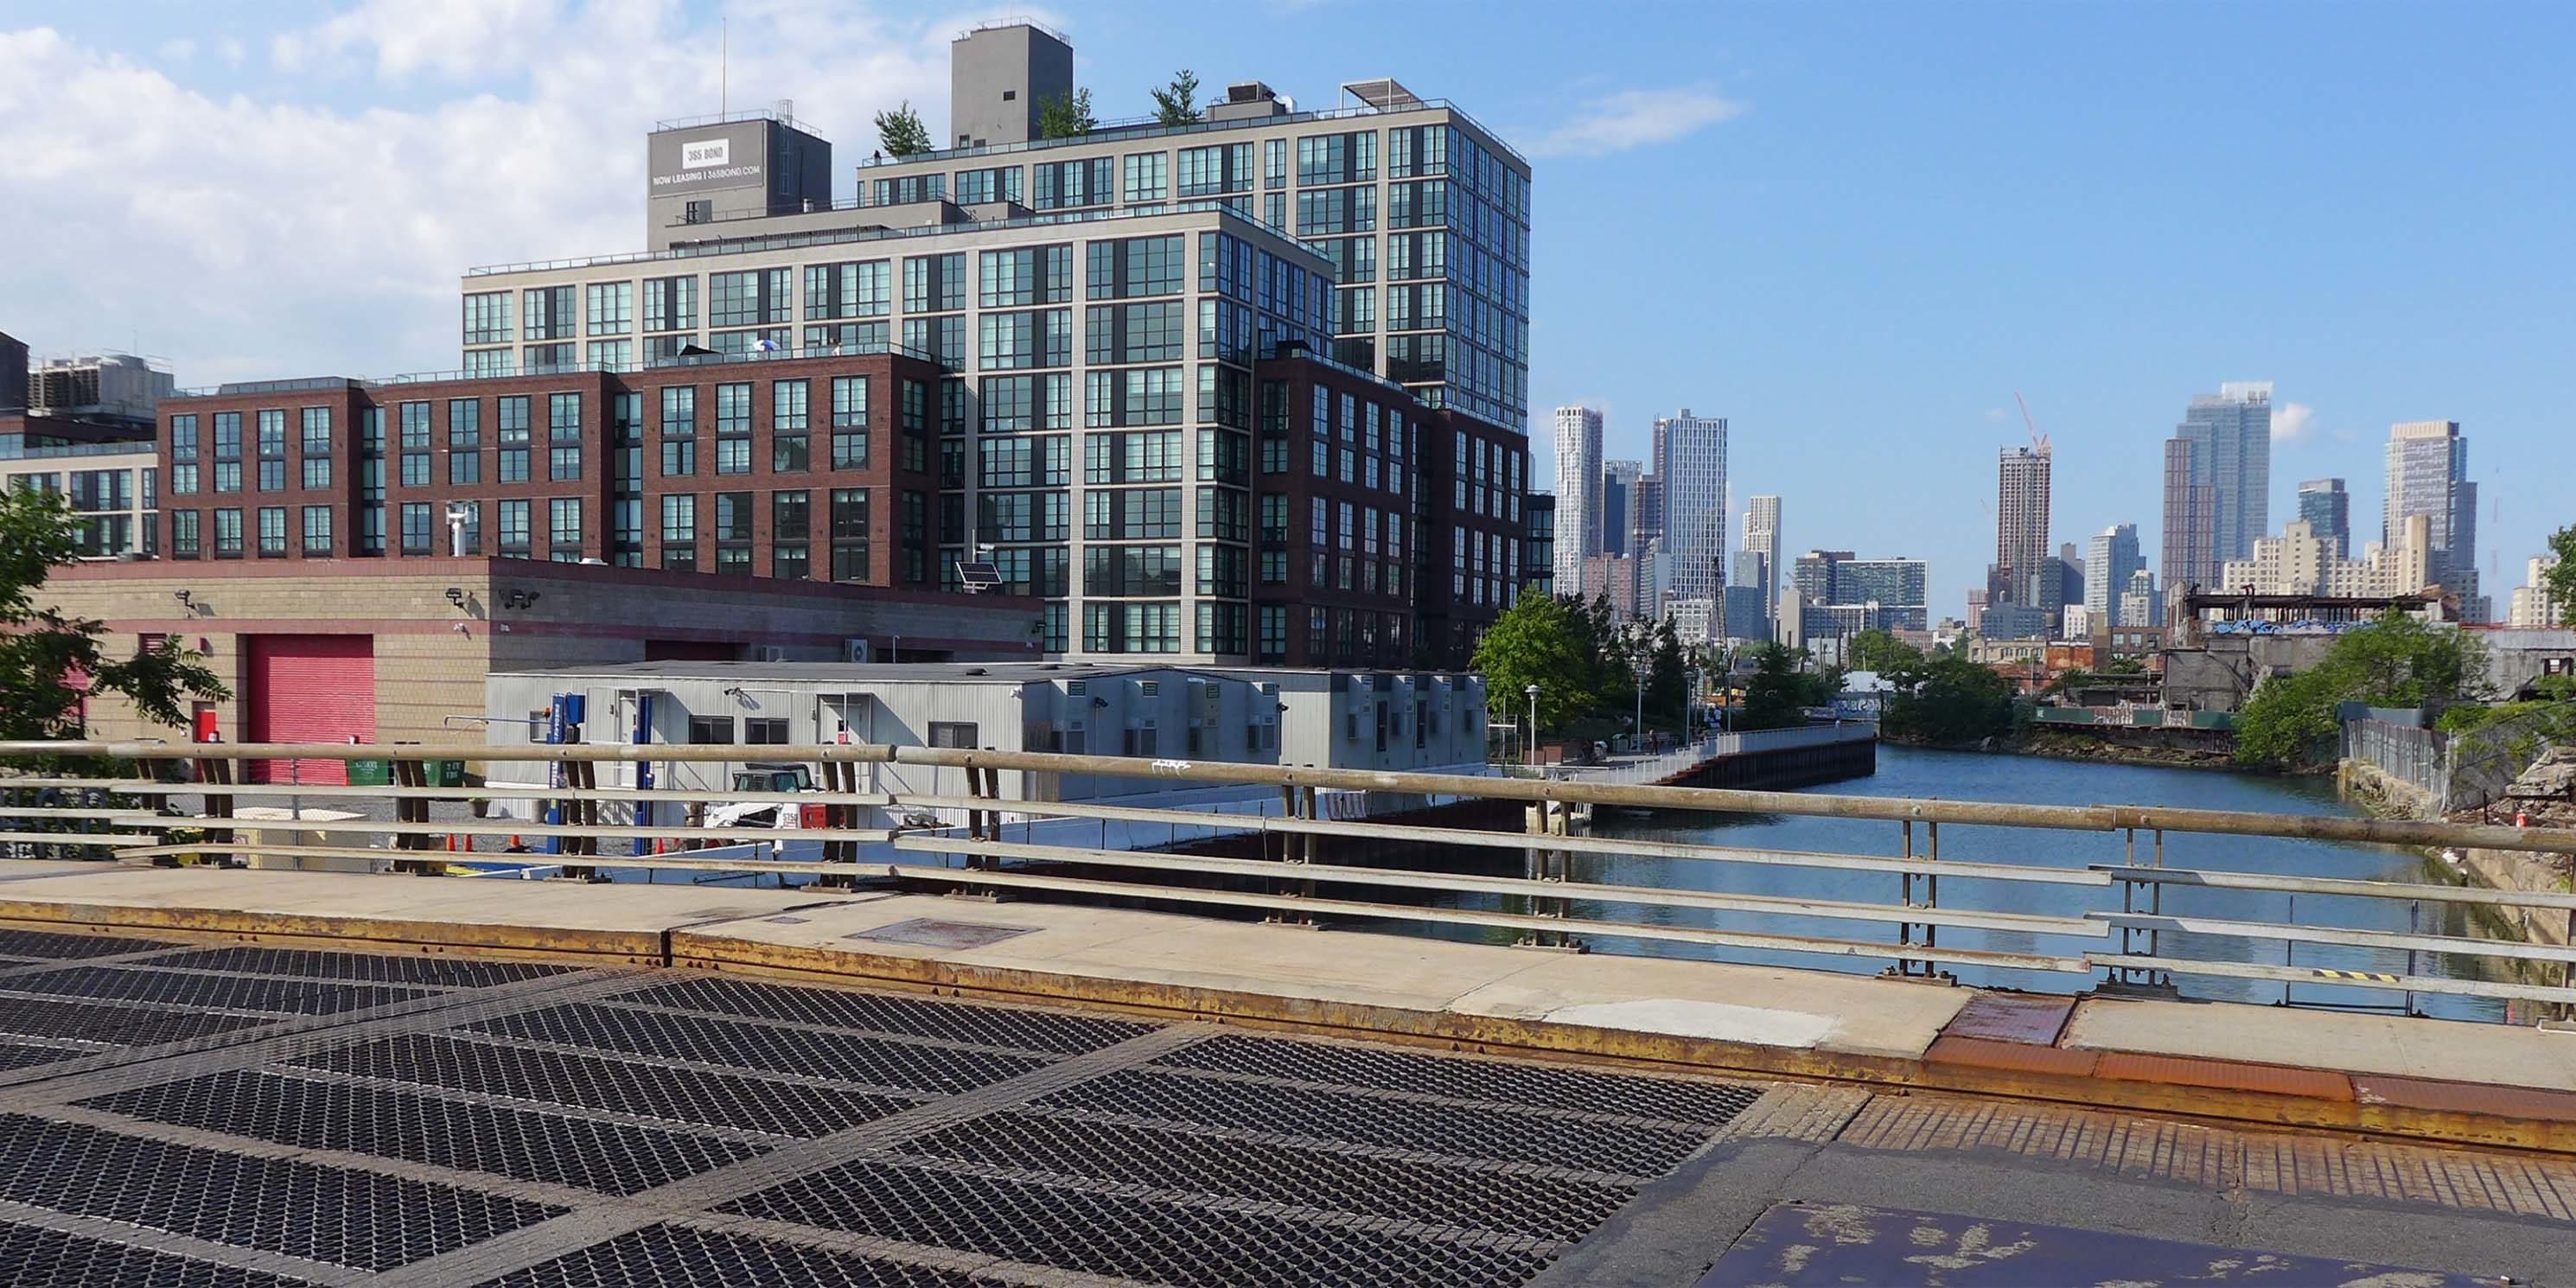 the Gowanus Canal as seen from a bridge